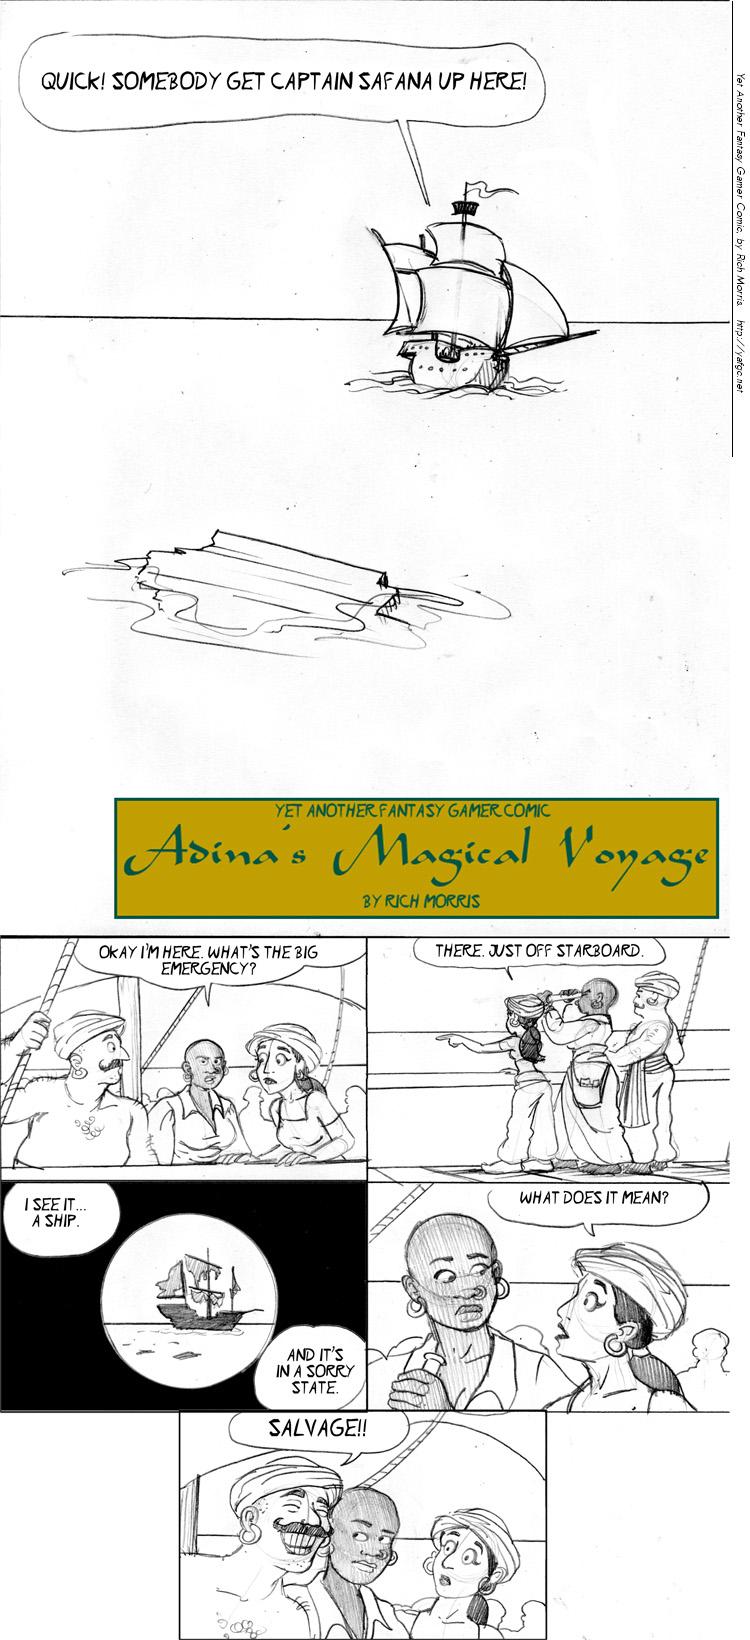 2234 Adinas Magical Voyage